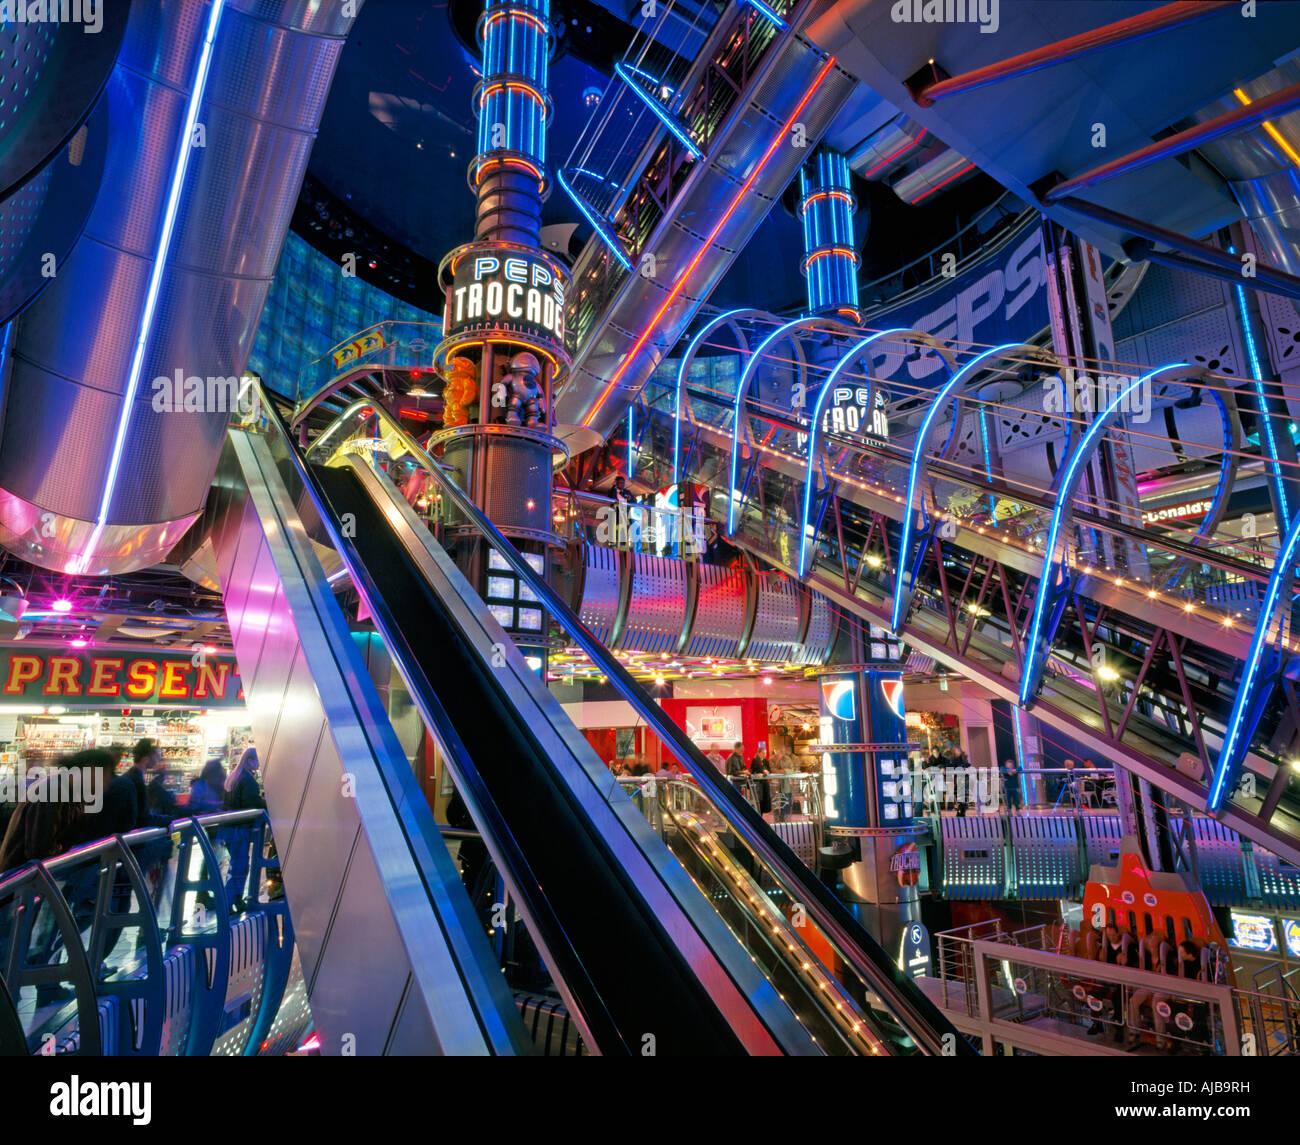 Light Shop Dubai Mall: Futuristic Space Age Interiors Of London Trocadero With